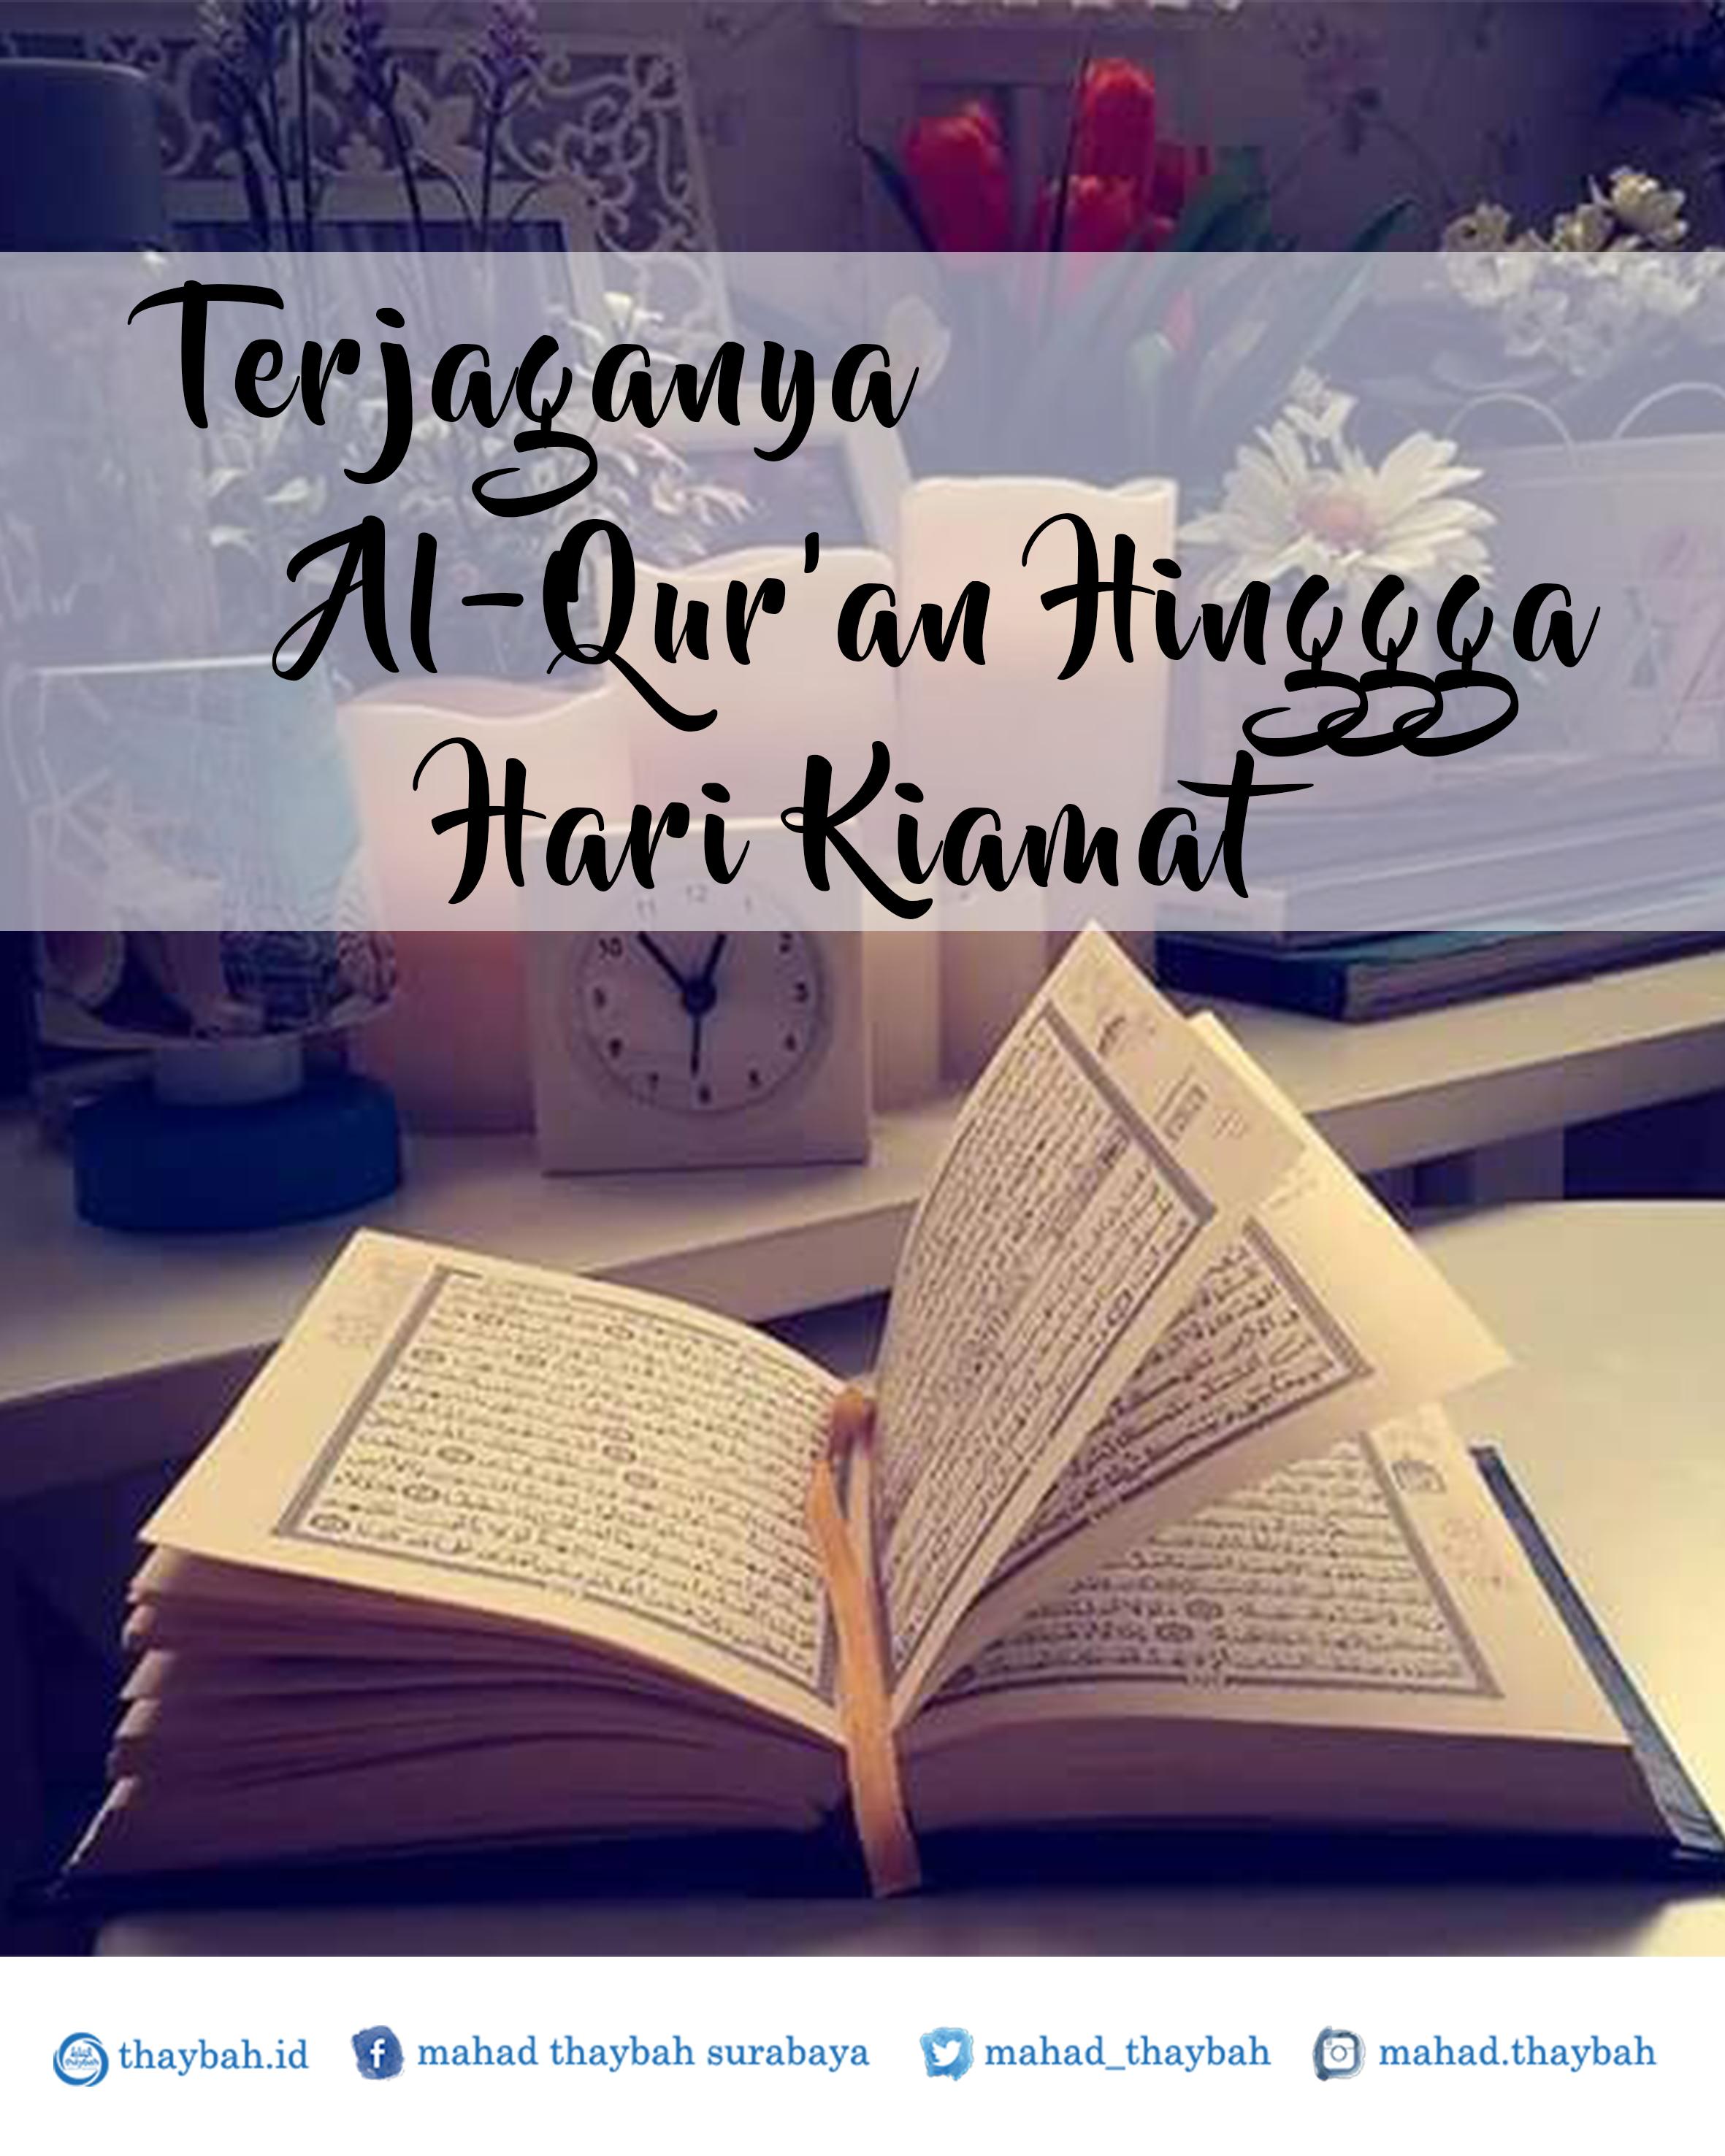 Terjaganya Al-Qur'an Hinggga Hari Kiamat